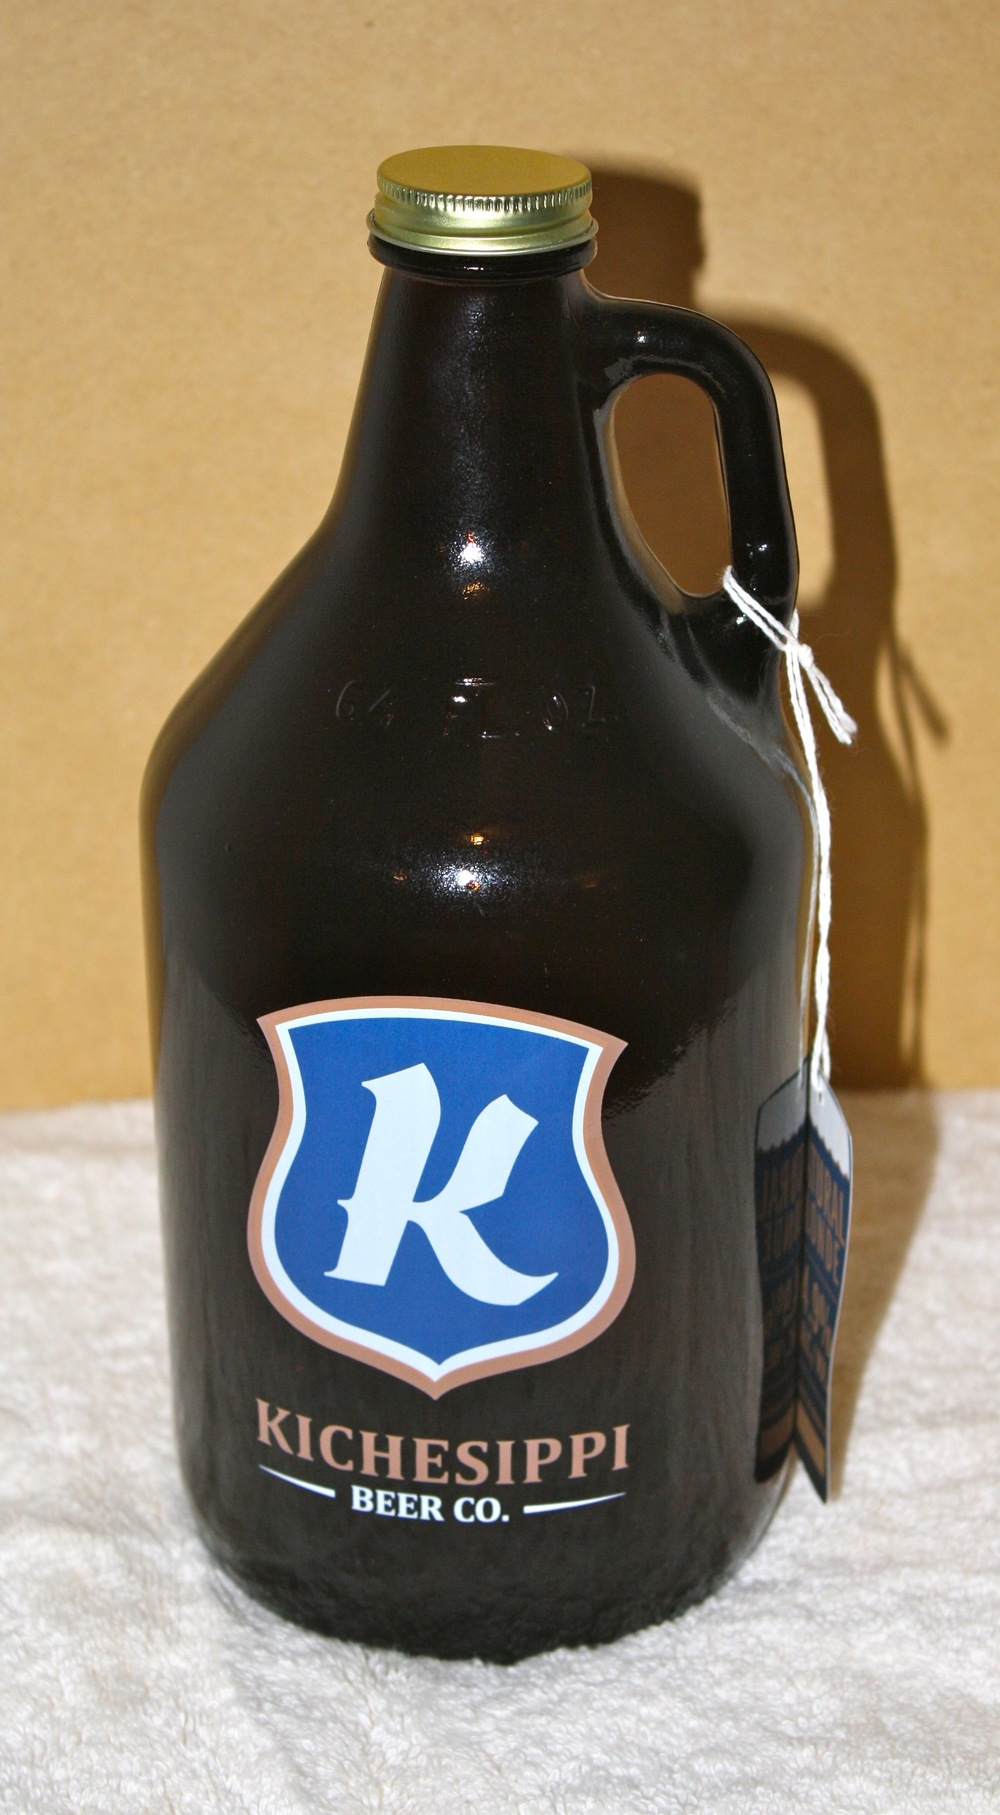 GR - Kichesippi Beer (ON).jpg